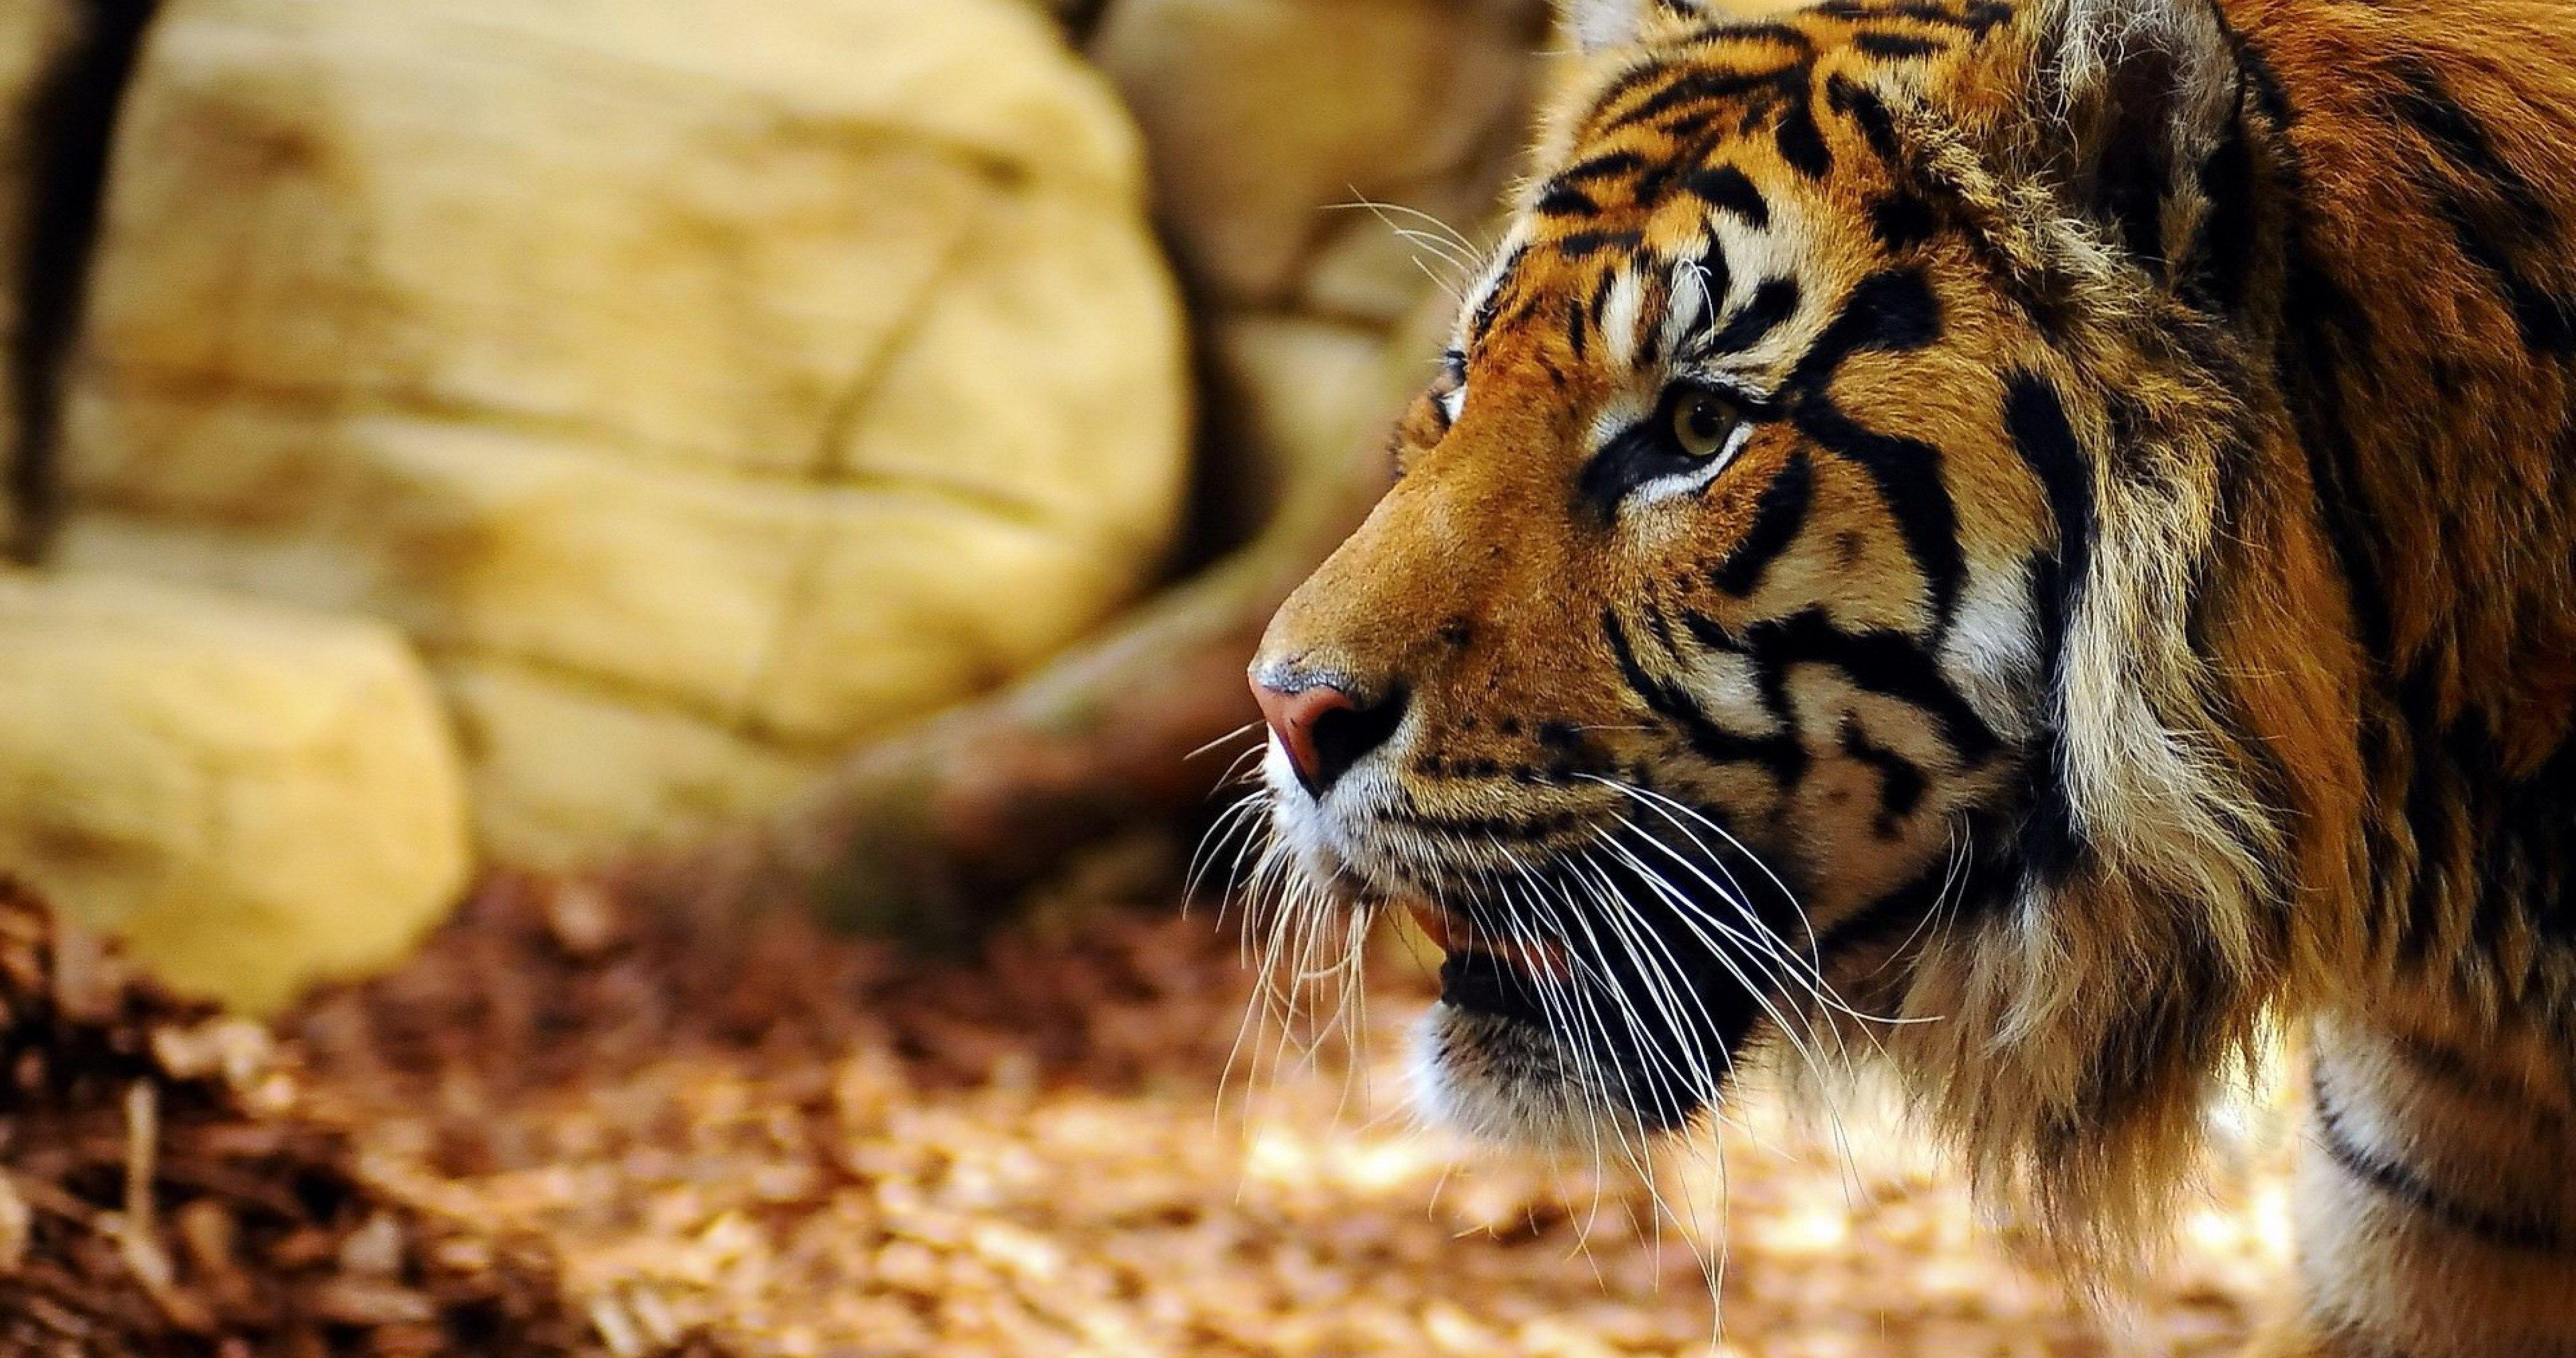 Tiger Face Profile 4k Ultra Hd Wallpaper Tiger Wallpaper Pet Tiger Tiger Face